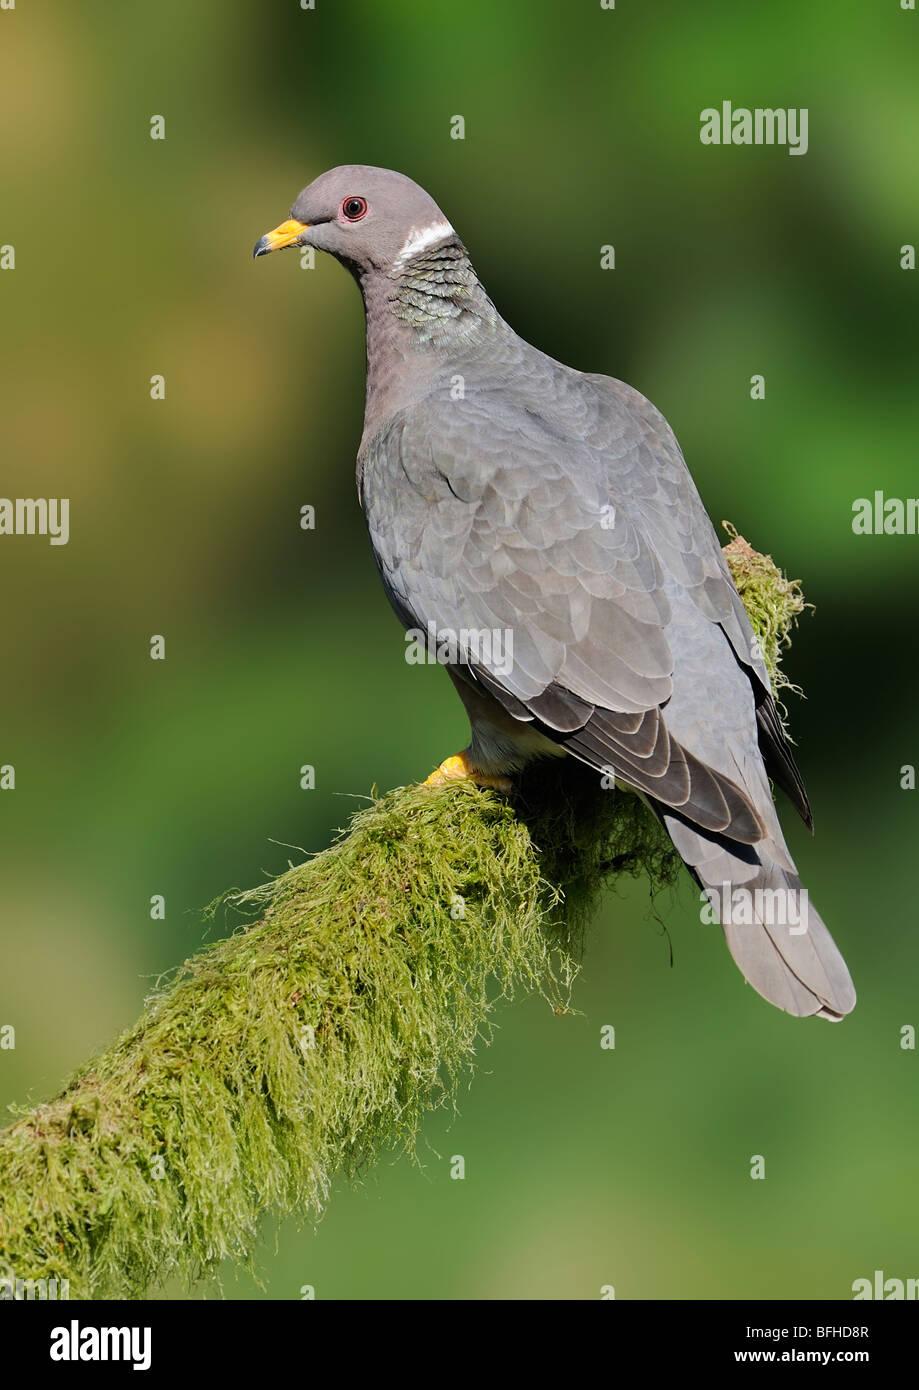 Band-tailed Pigeon (Patagioenas fasciata) on perch Victoria BC, Canada - Stock Image